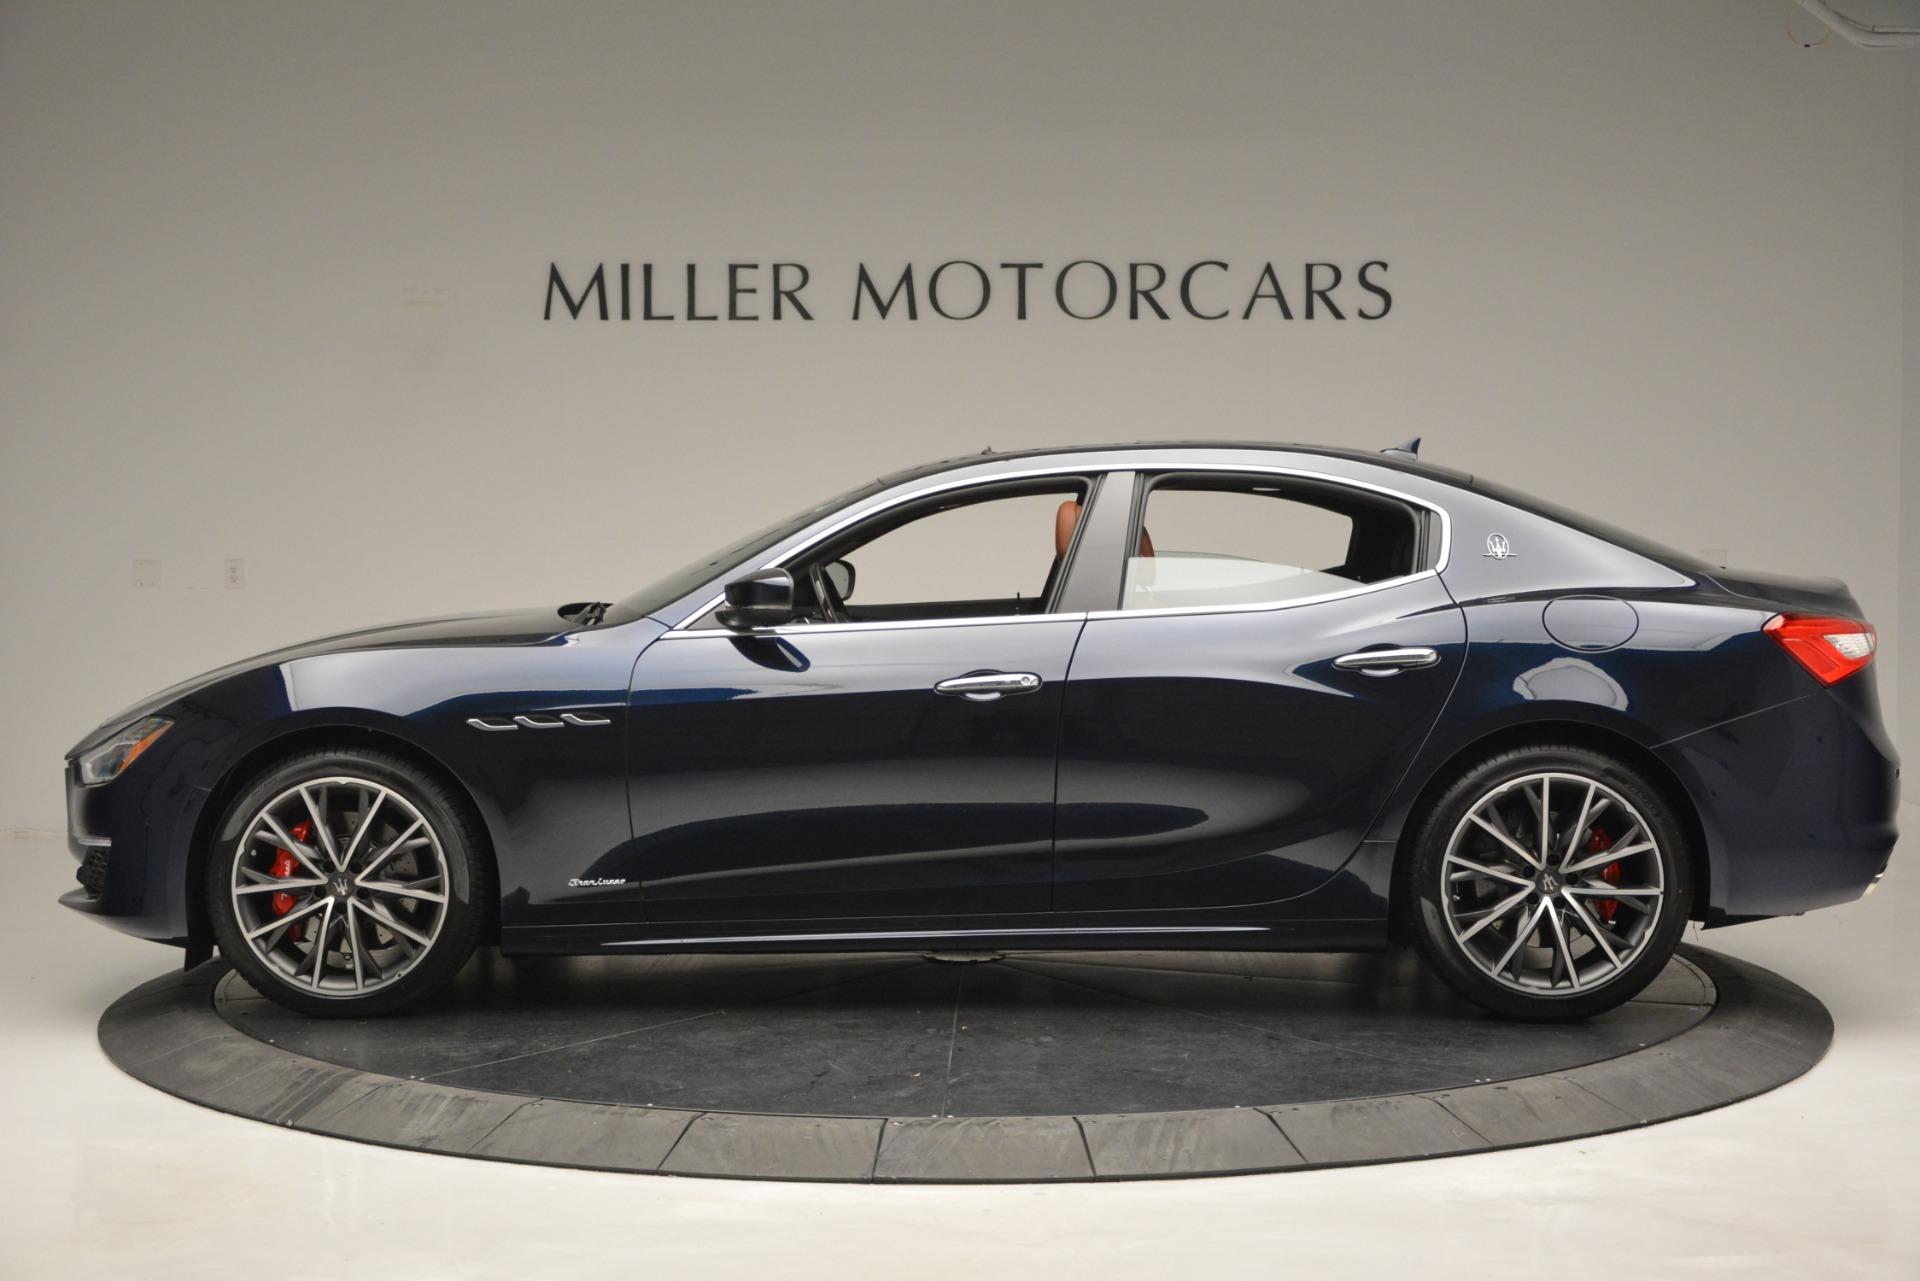 New 2019 Maserati Ghibli S Q4 GranSport For Sale In Greenwich, CT. Alfa Romeo of Greenwich, M2264 2948_p4